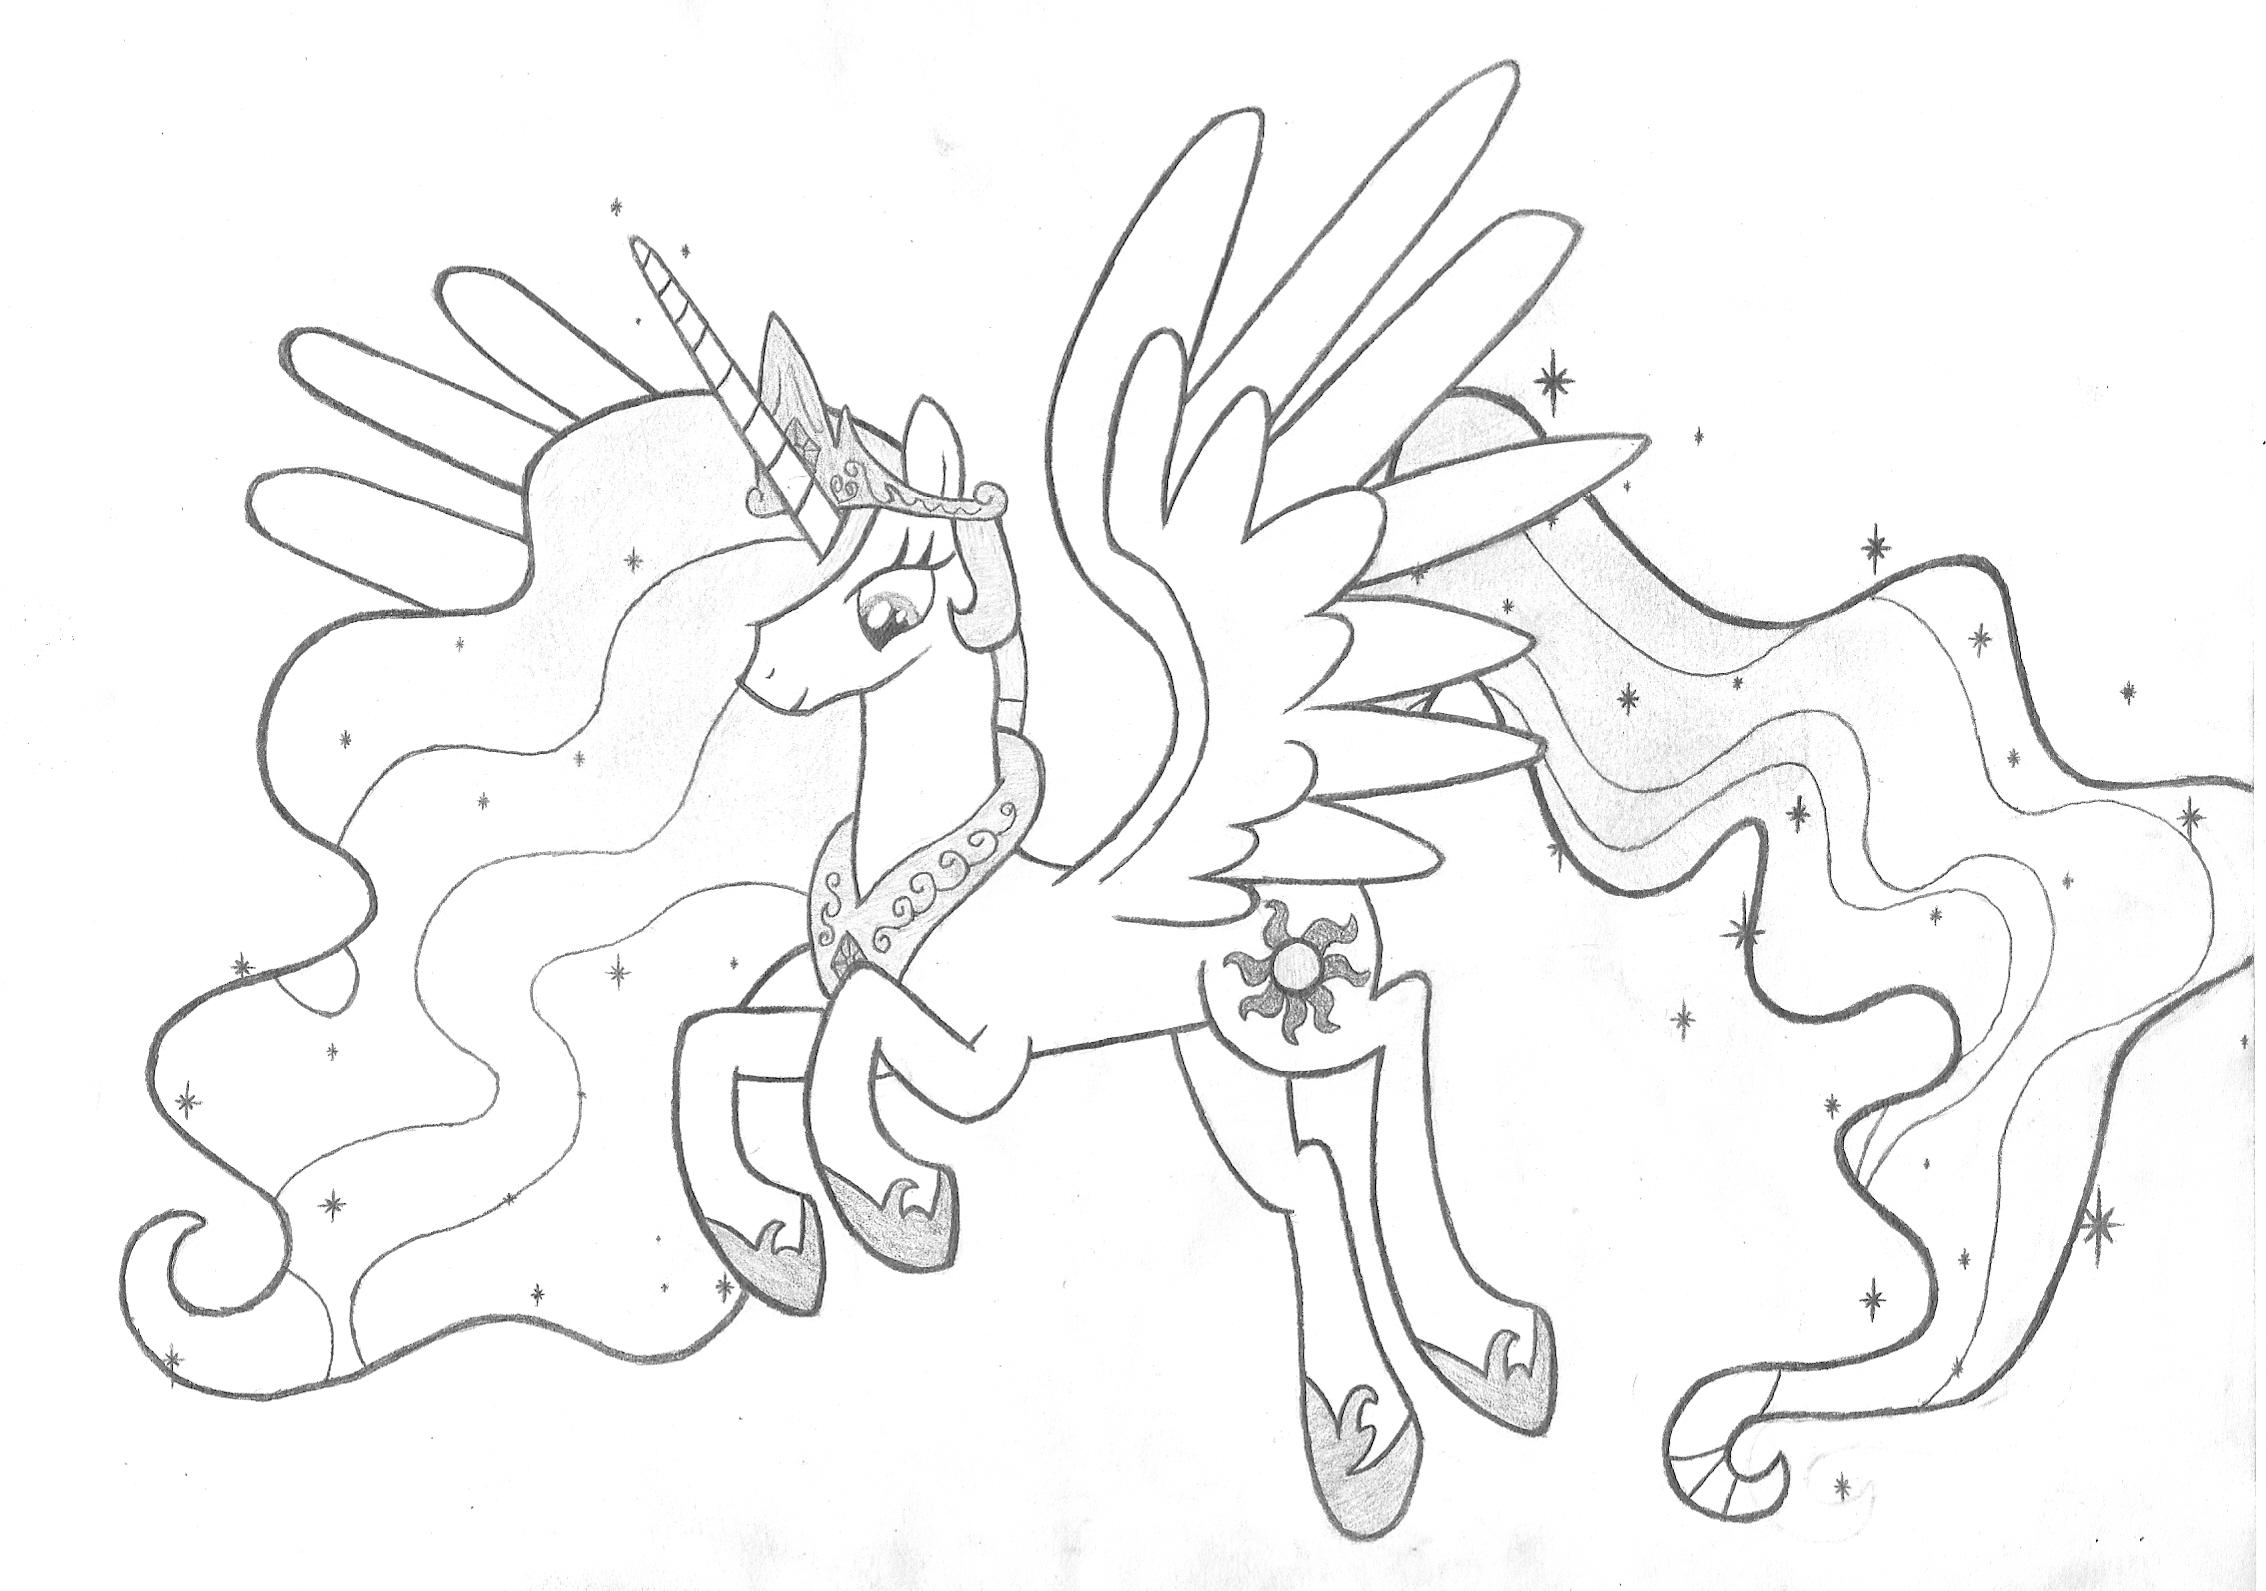 Mah pony drawing attempts Princess_celestia_sketch_by_rohulk2008-d4bamkq